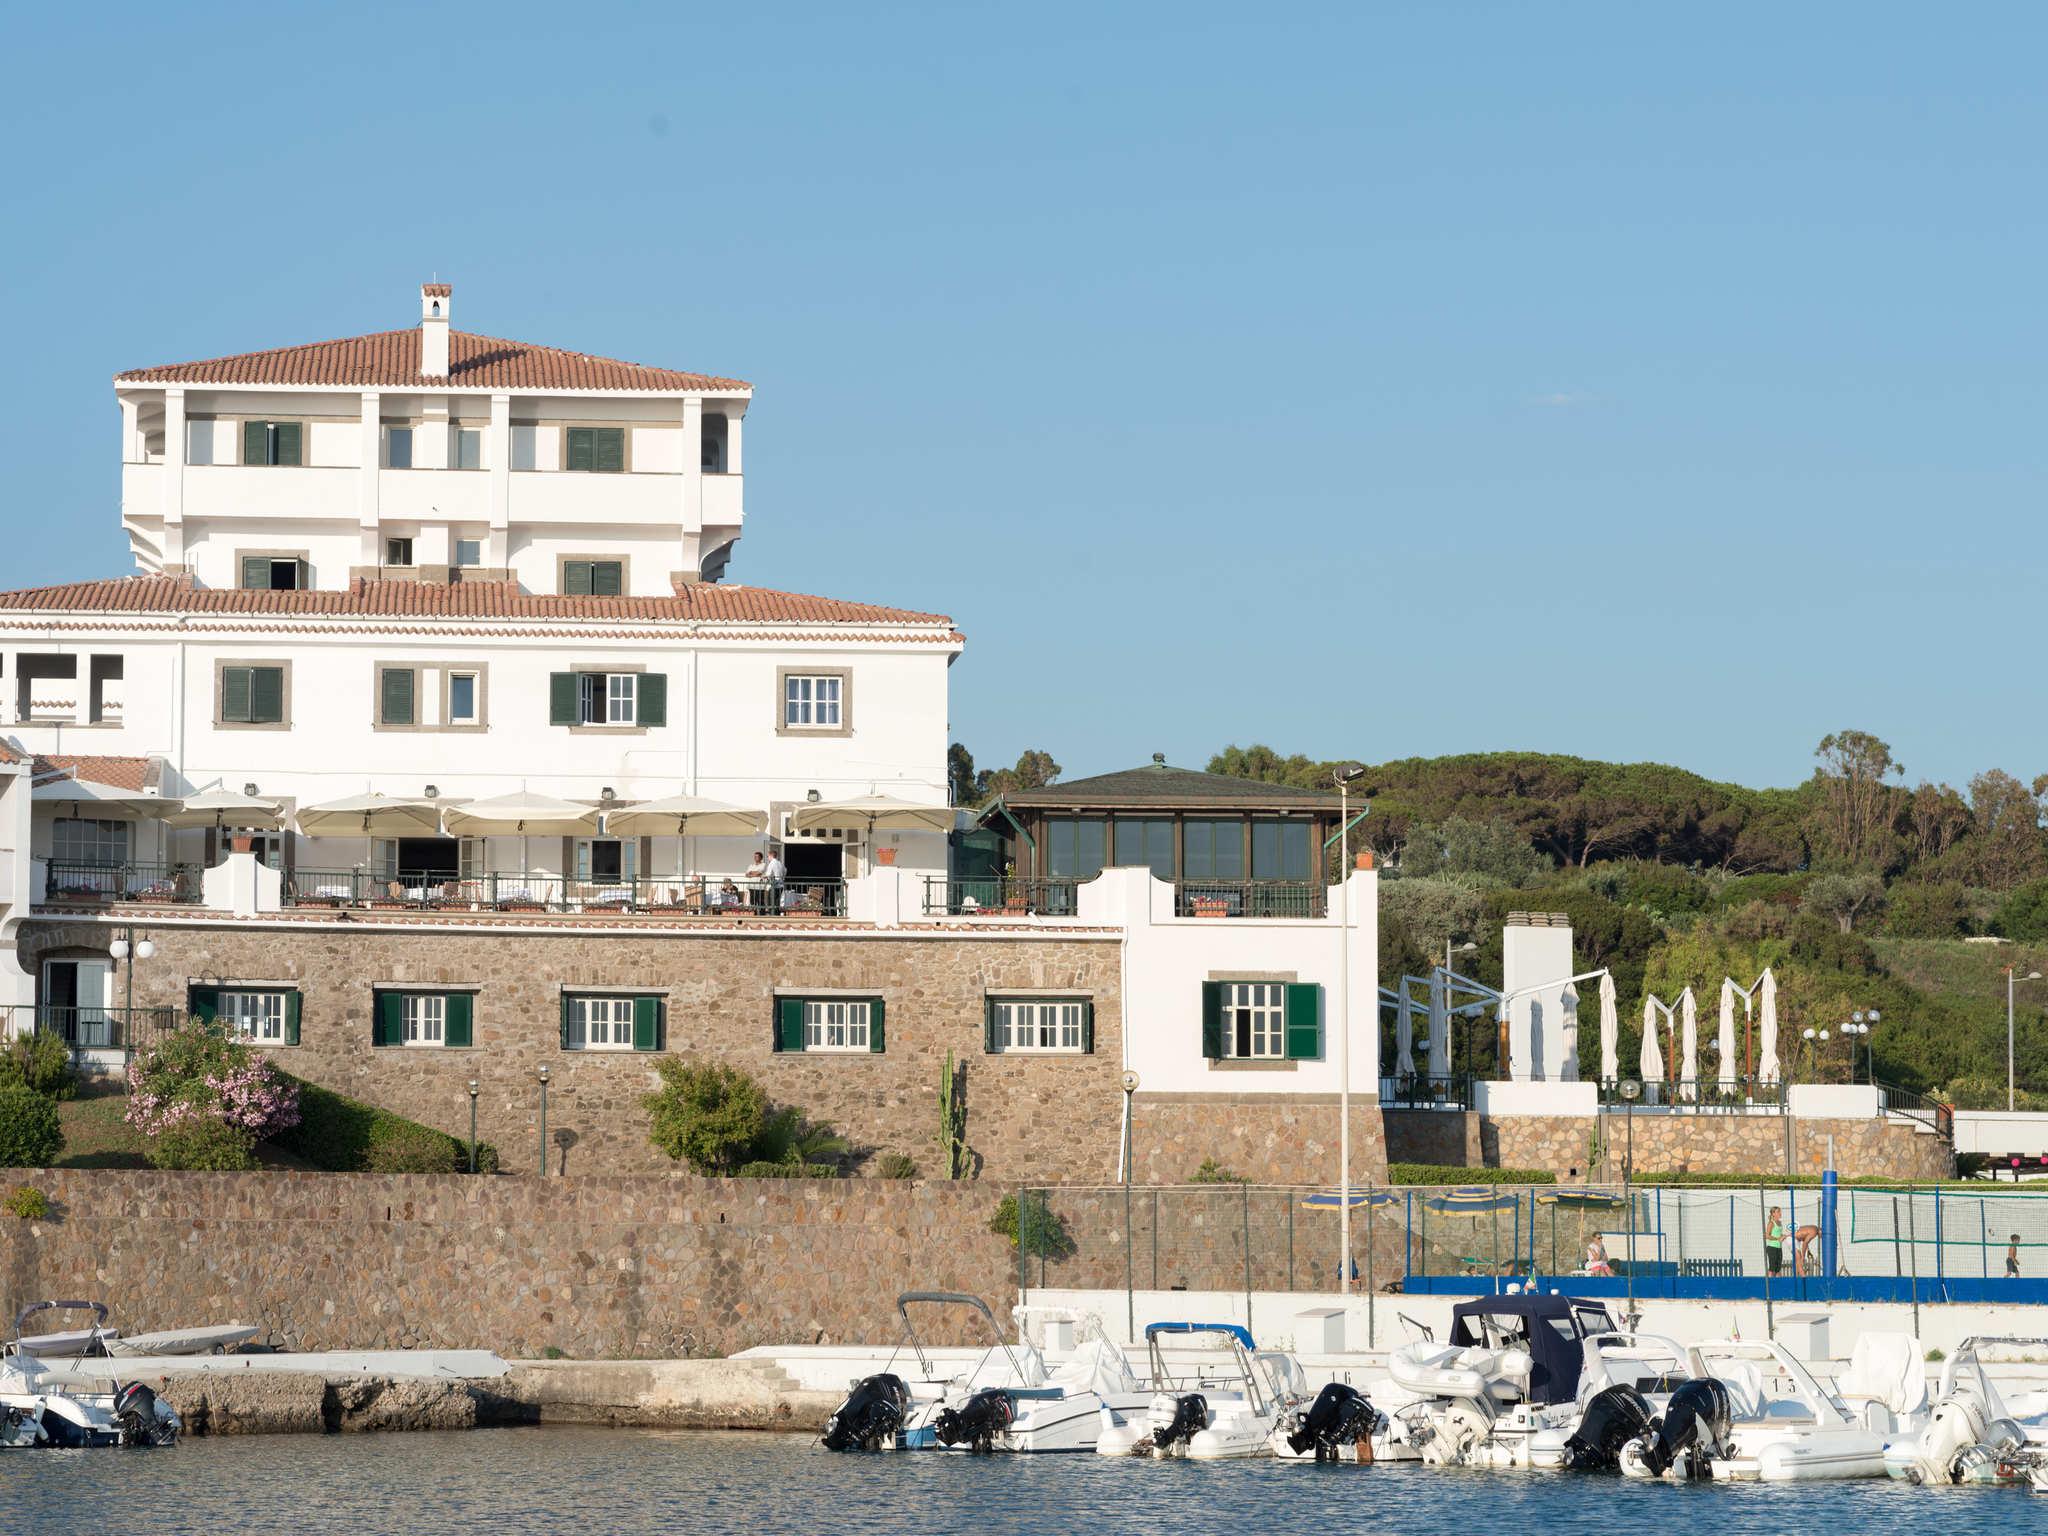 Otel – Mercure Civitavecchia Sunbay Park Hotel - New Opening